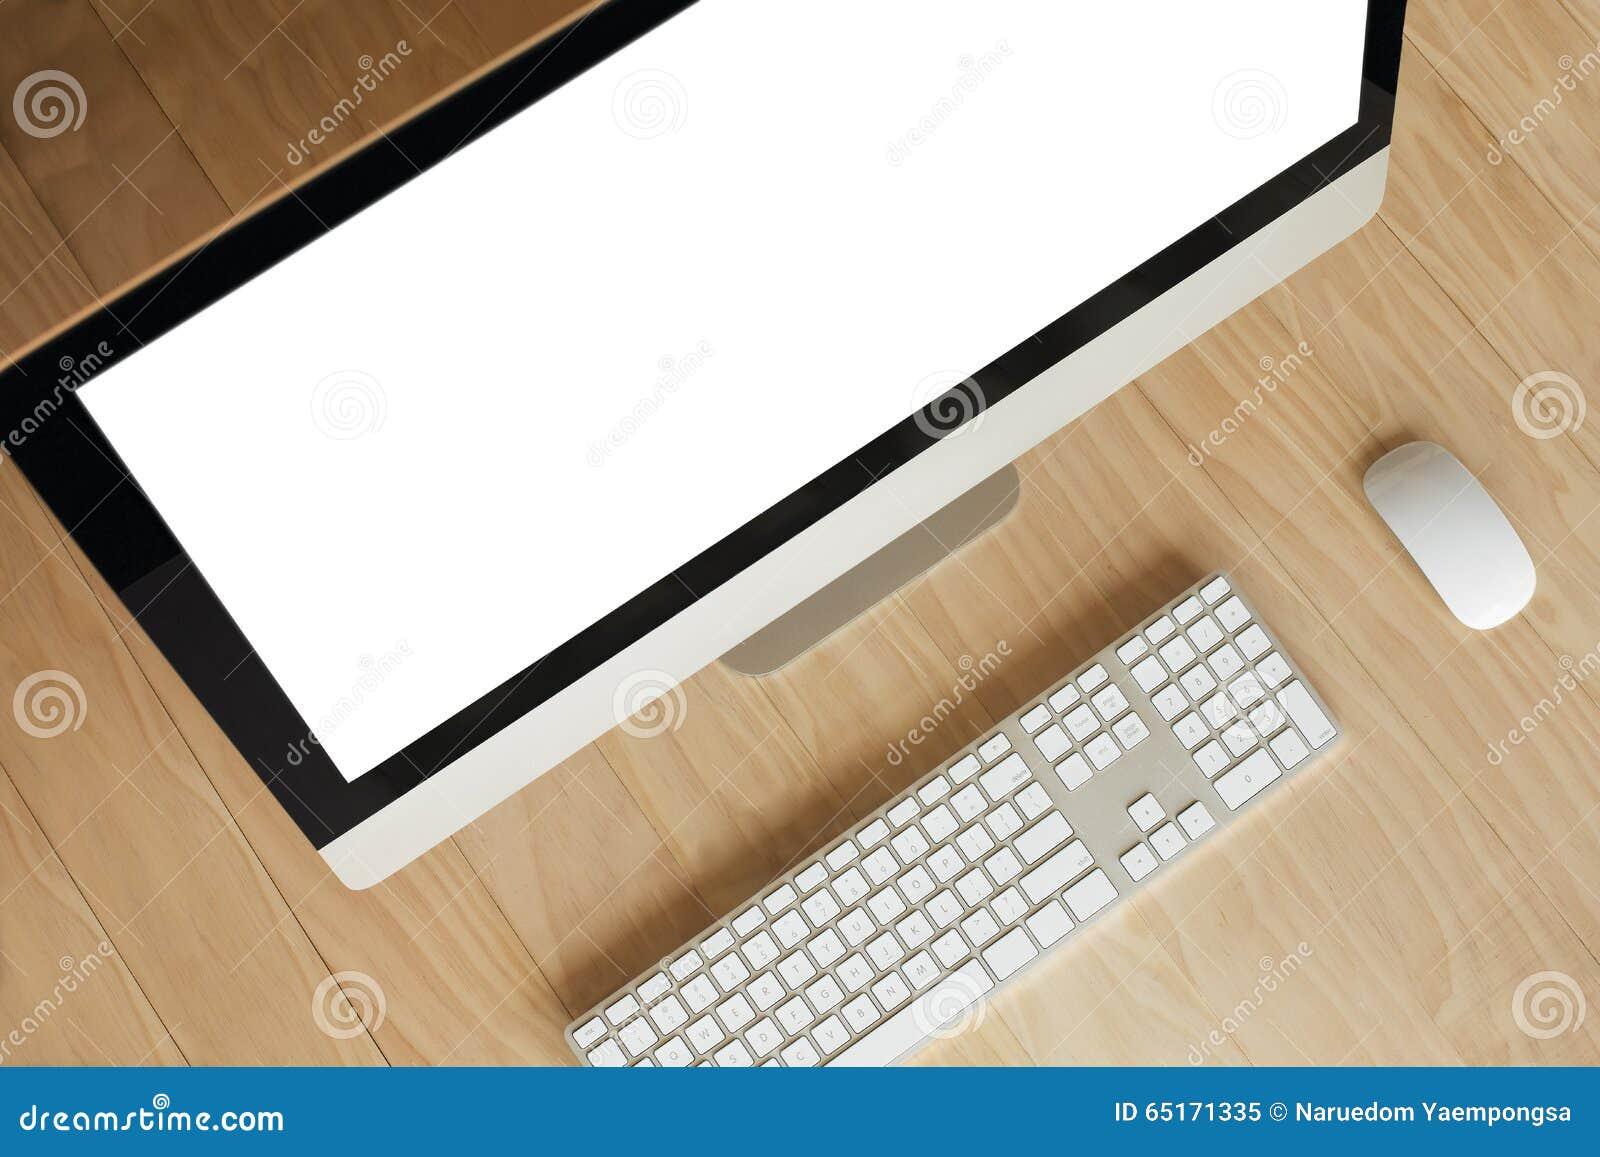 Equipo de escritorio